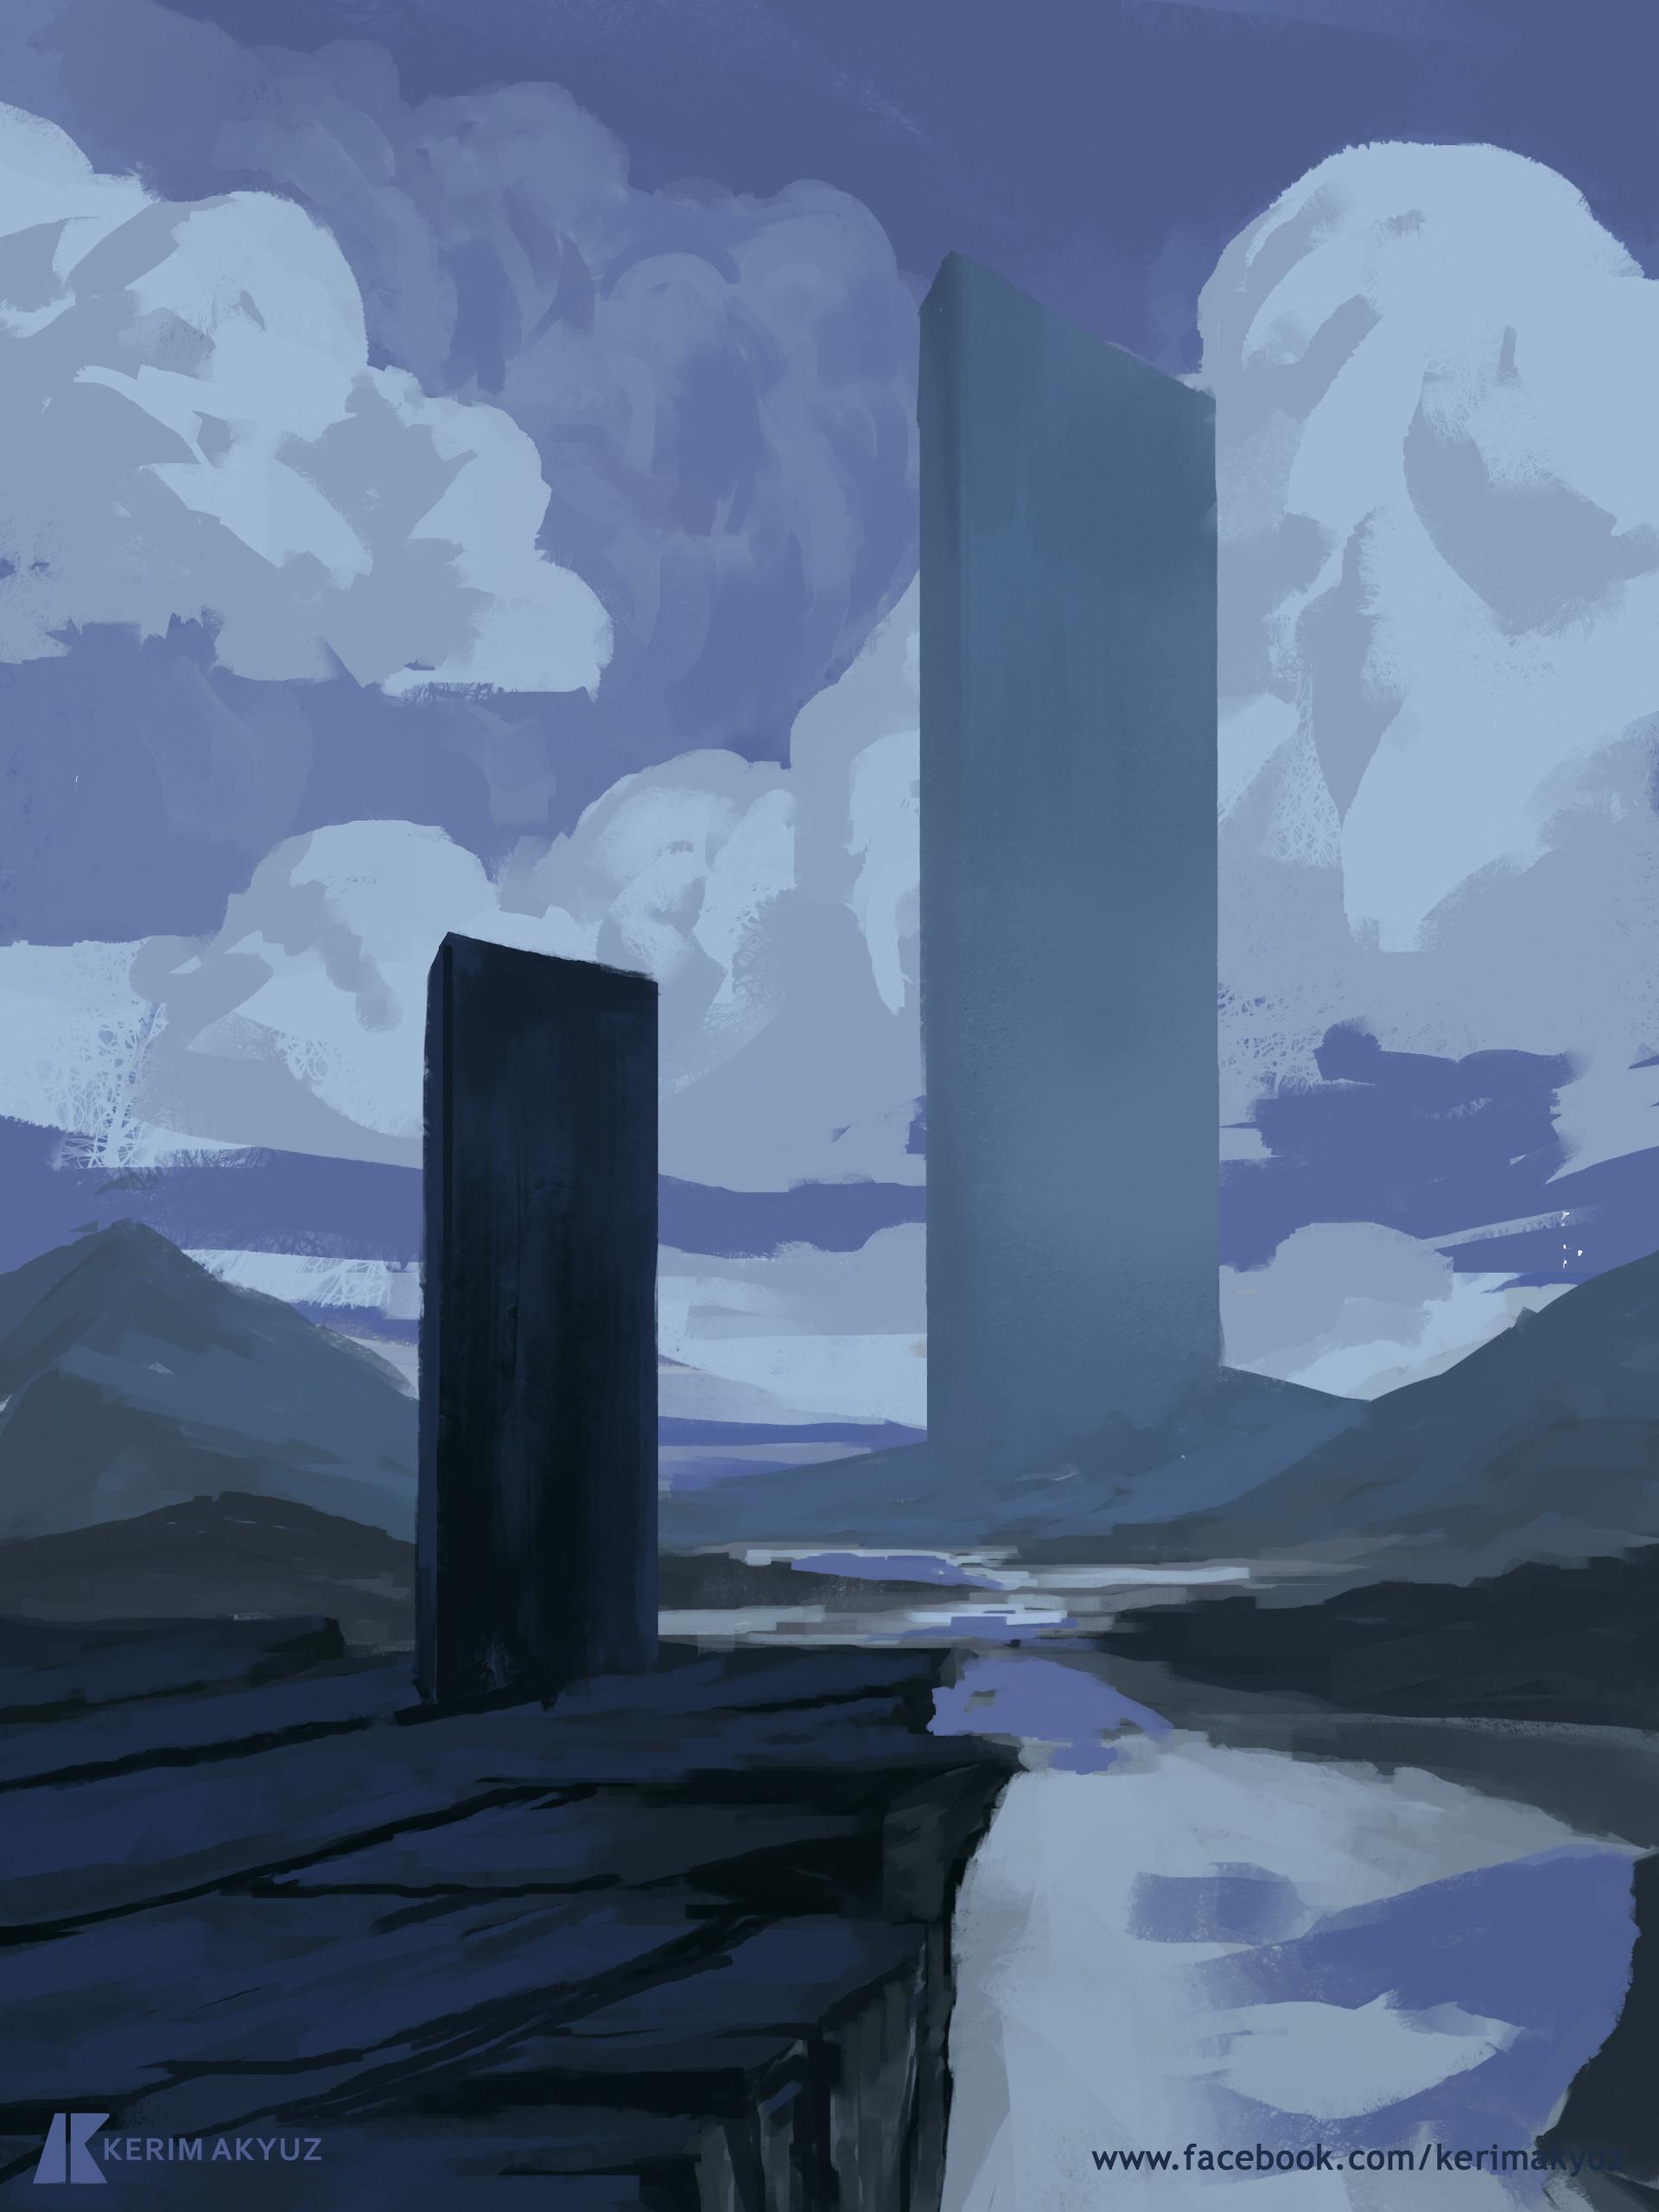 Kerim akyuz 276 monolith